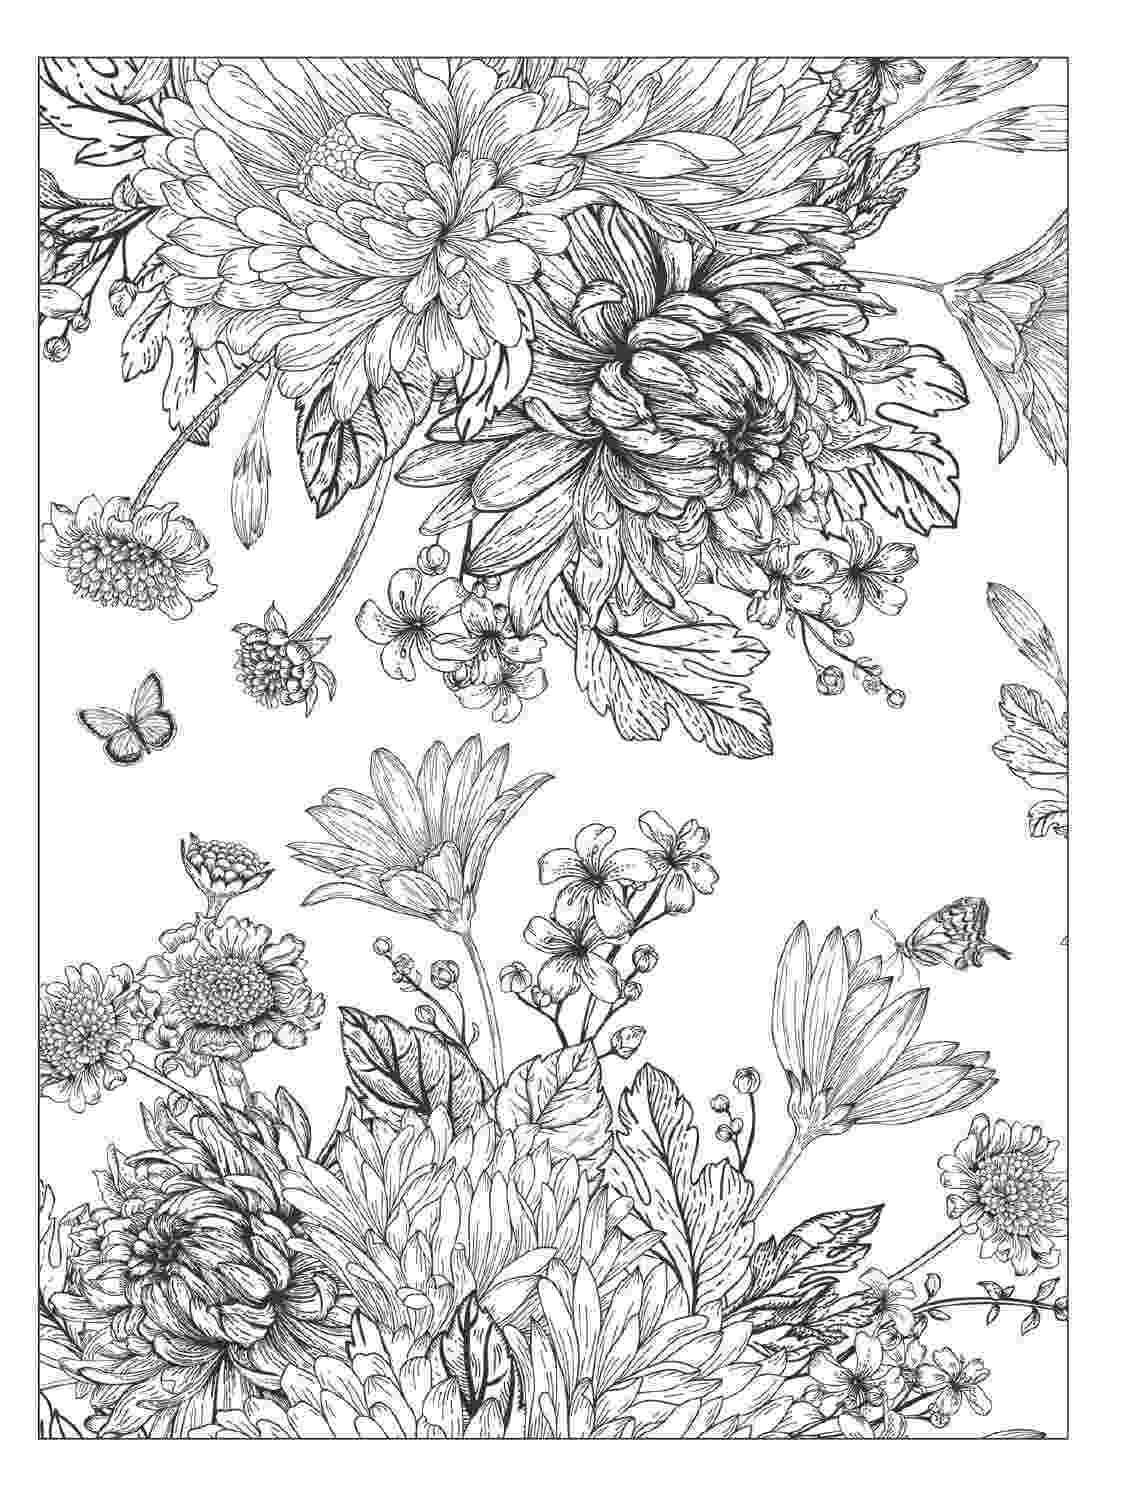 floral designs coloring book beautiful flowers detailed floral designs coloring book coloring floral designs book